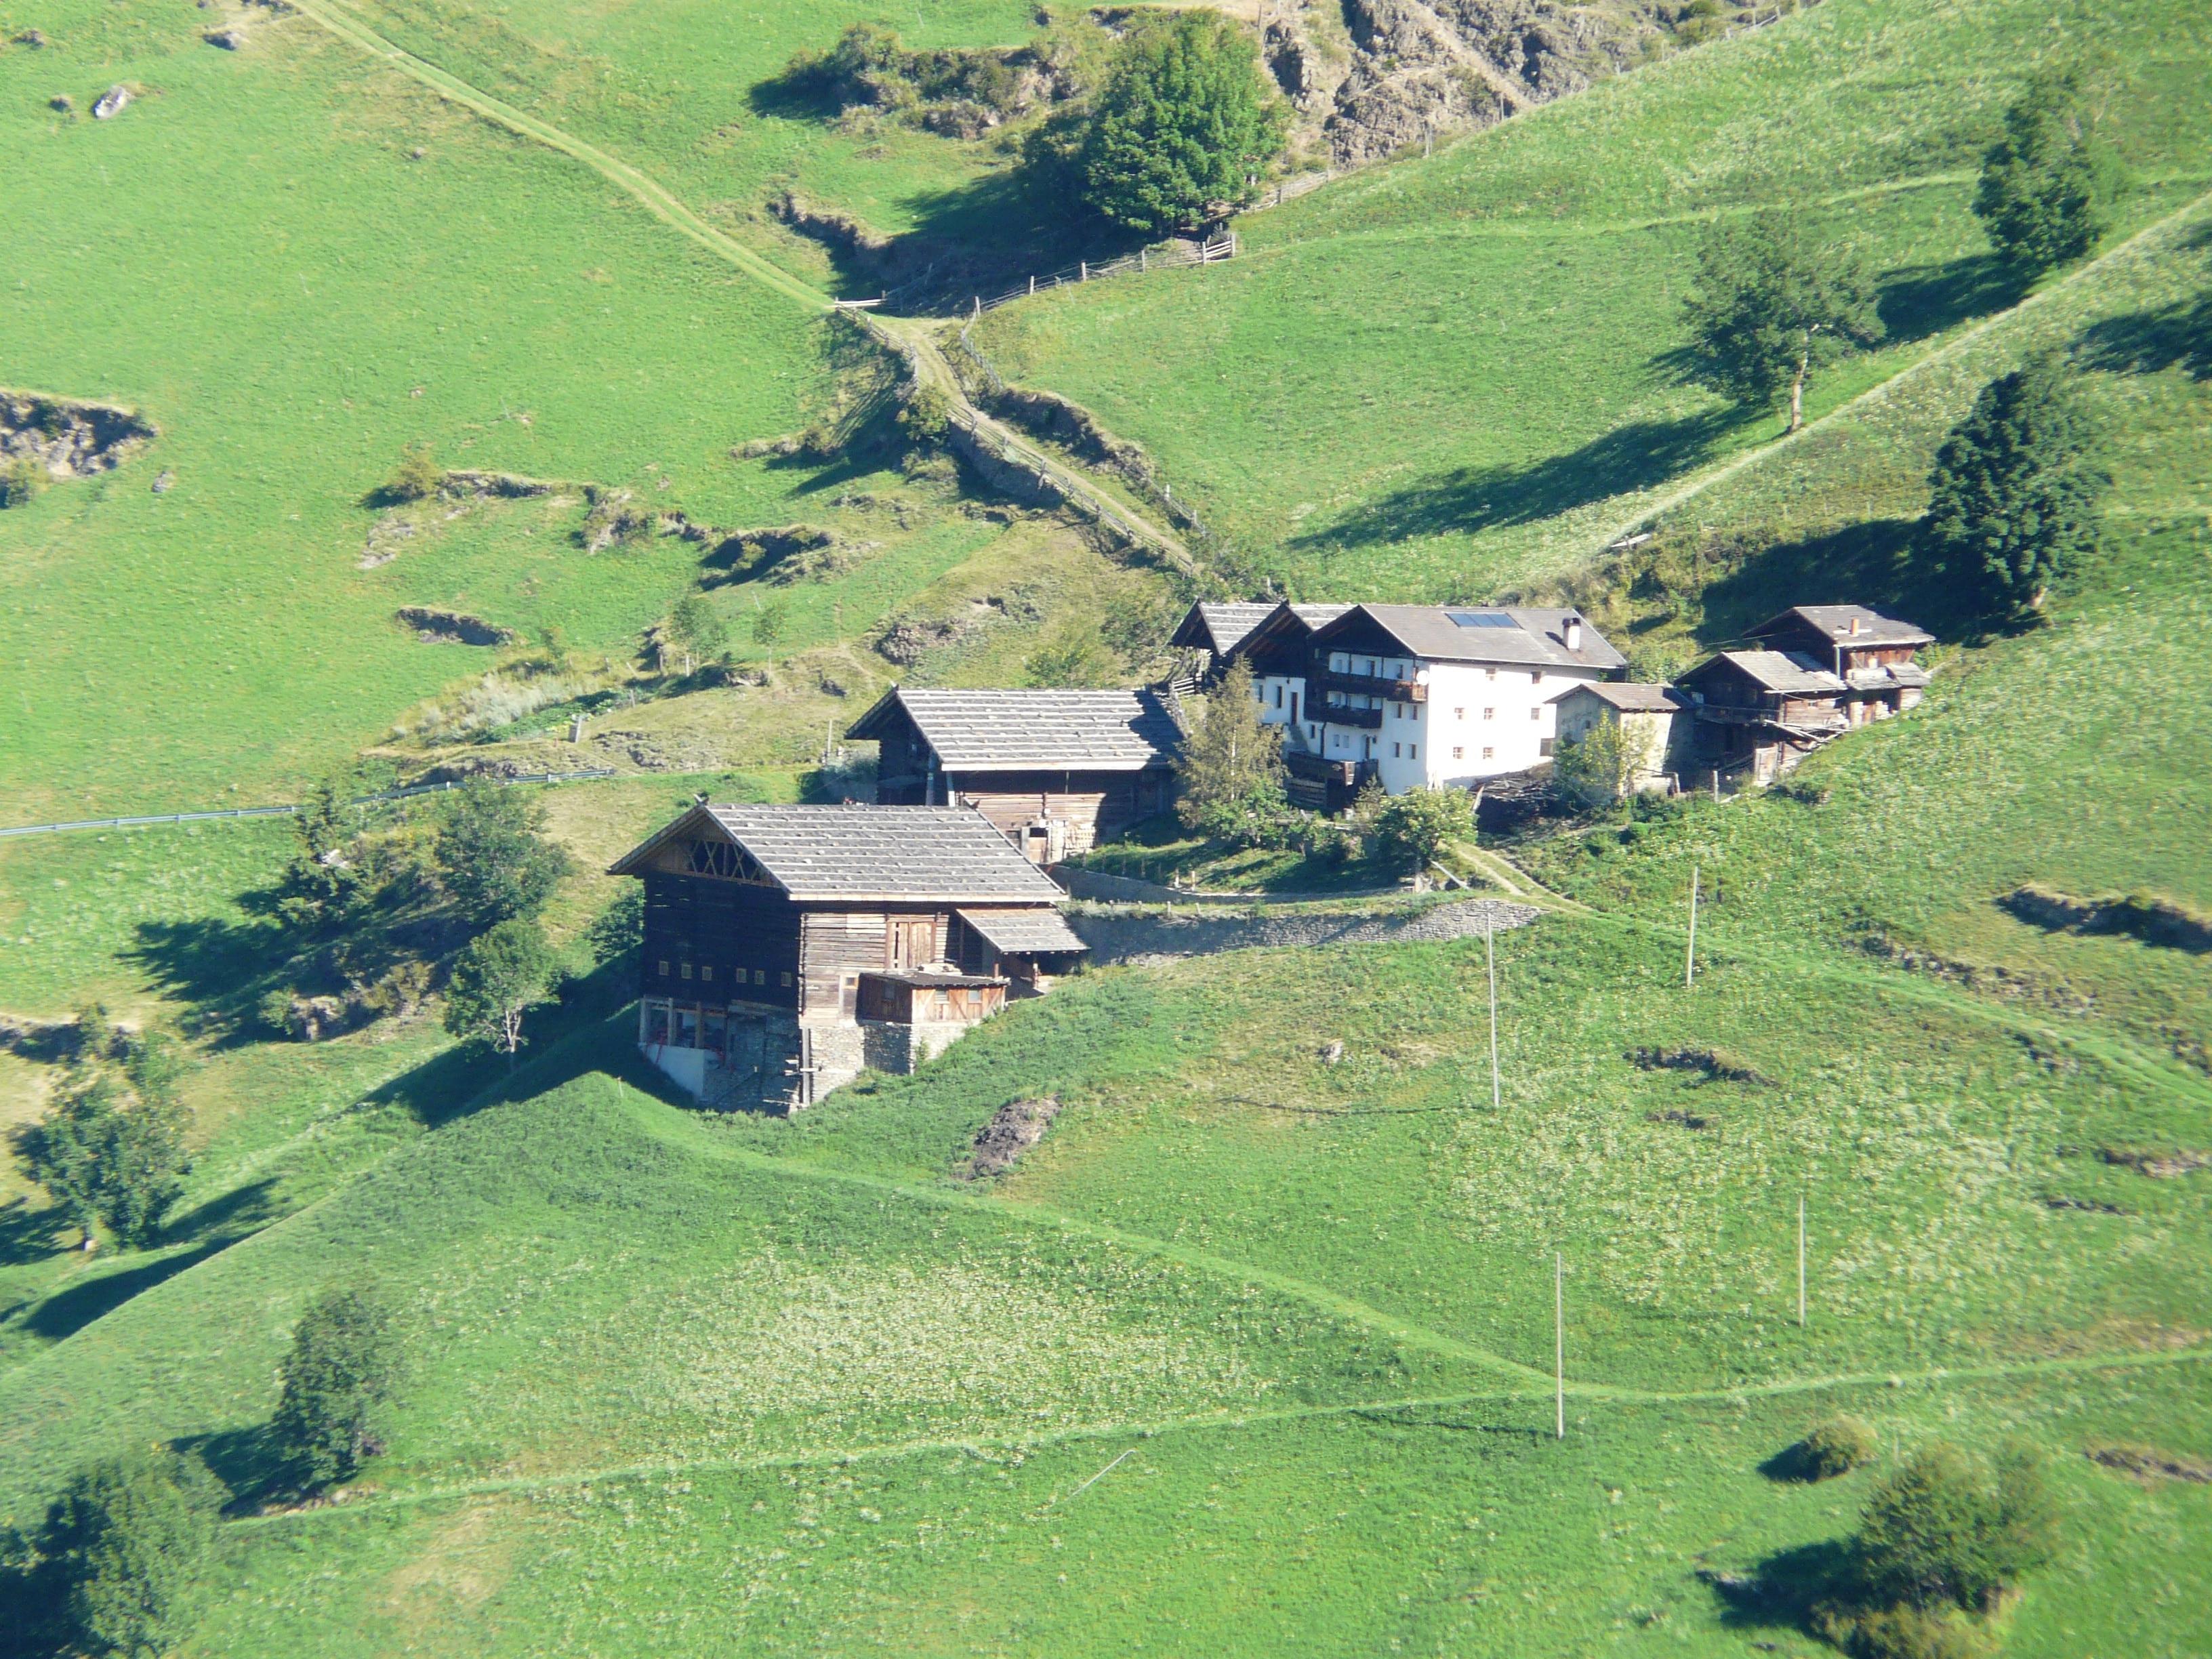 Val Senales, Senales, Trentino-Alto Adige, Italy